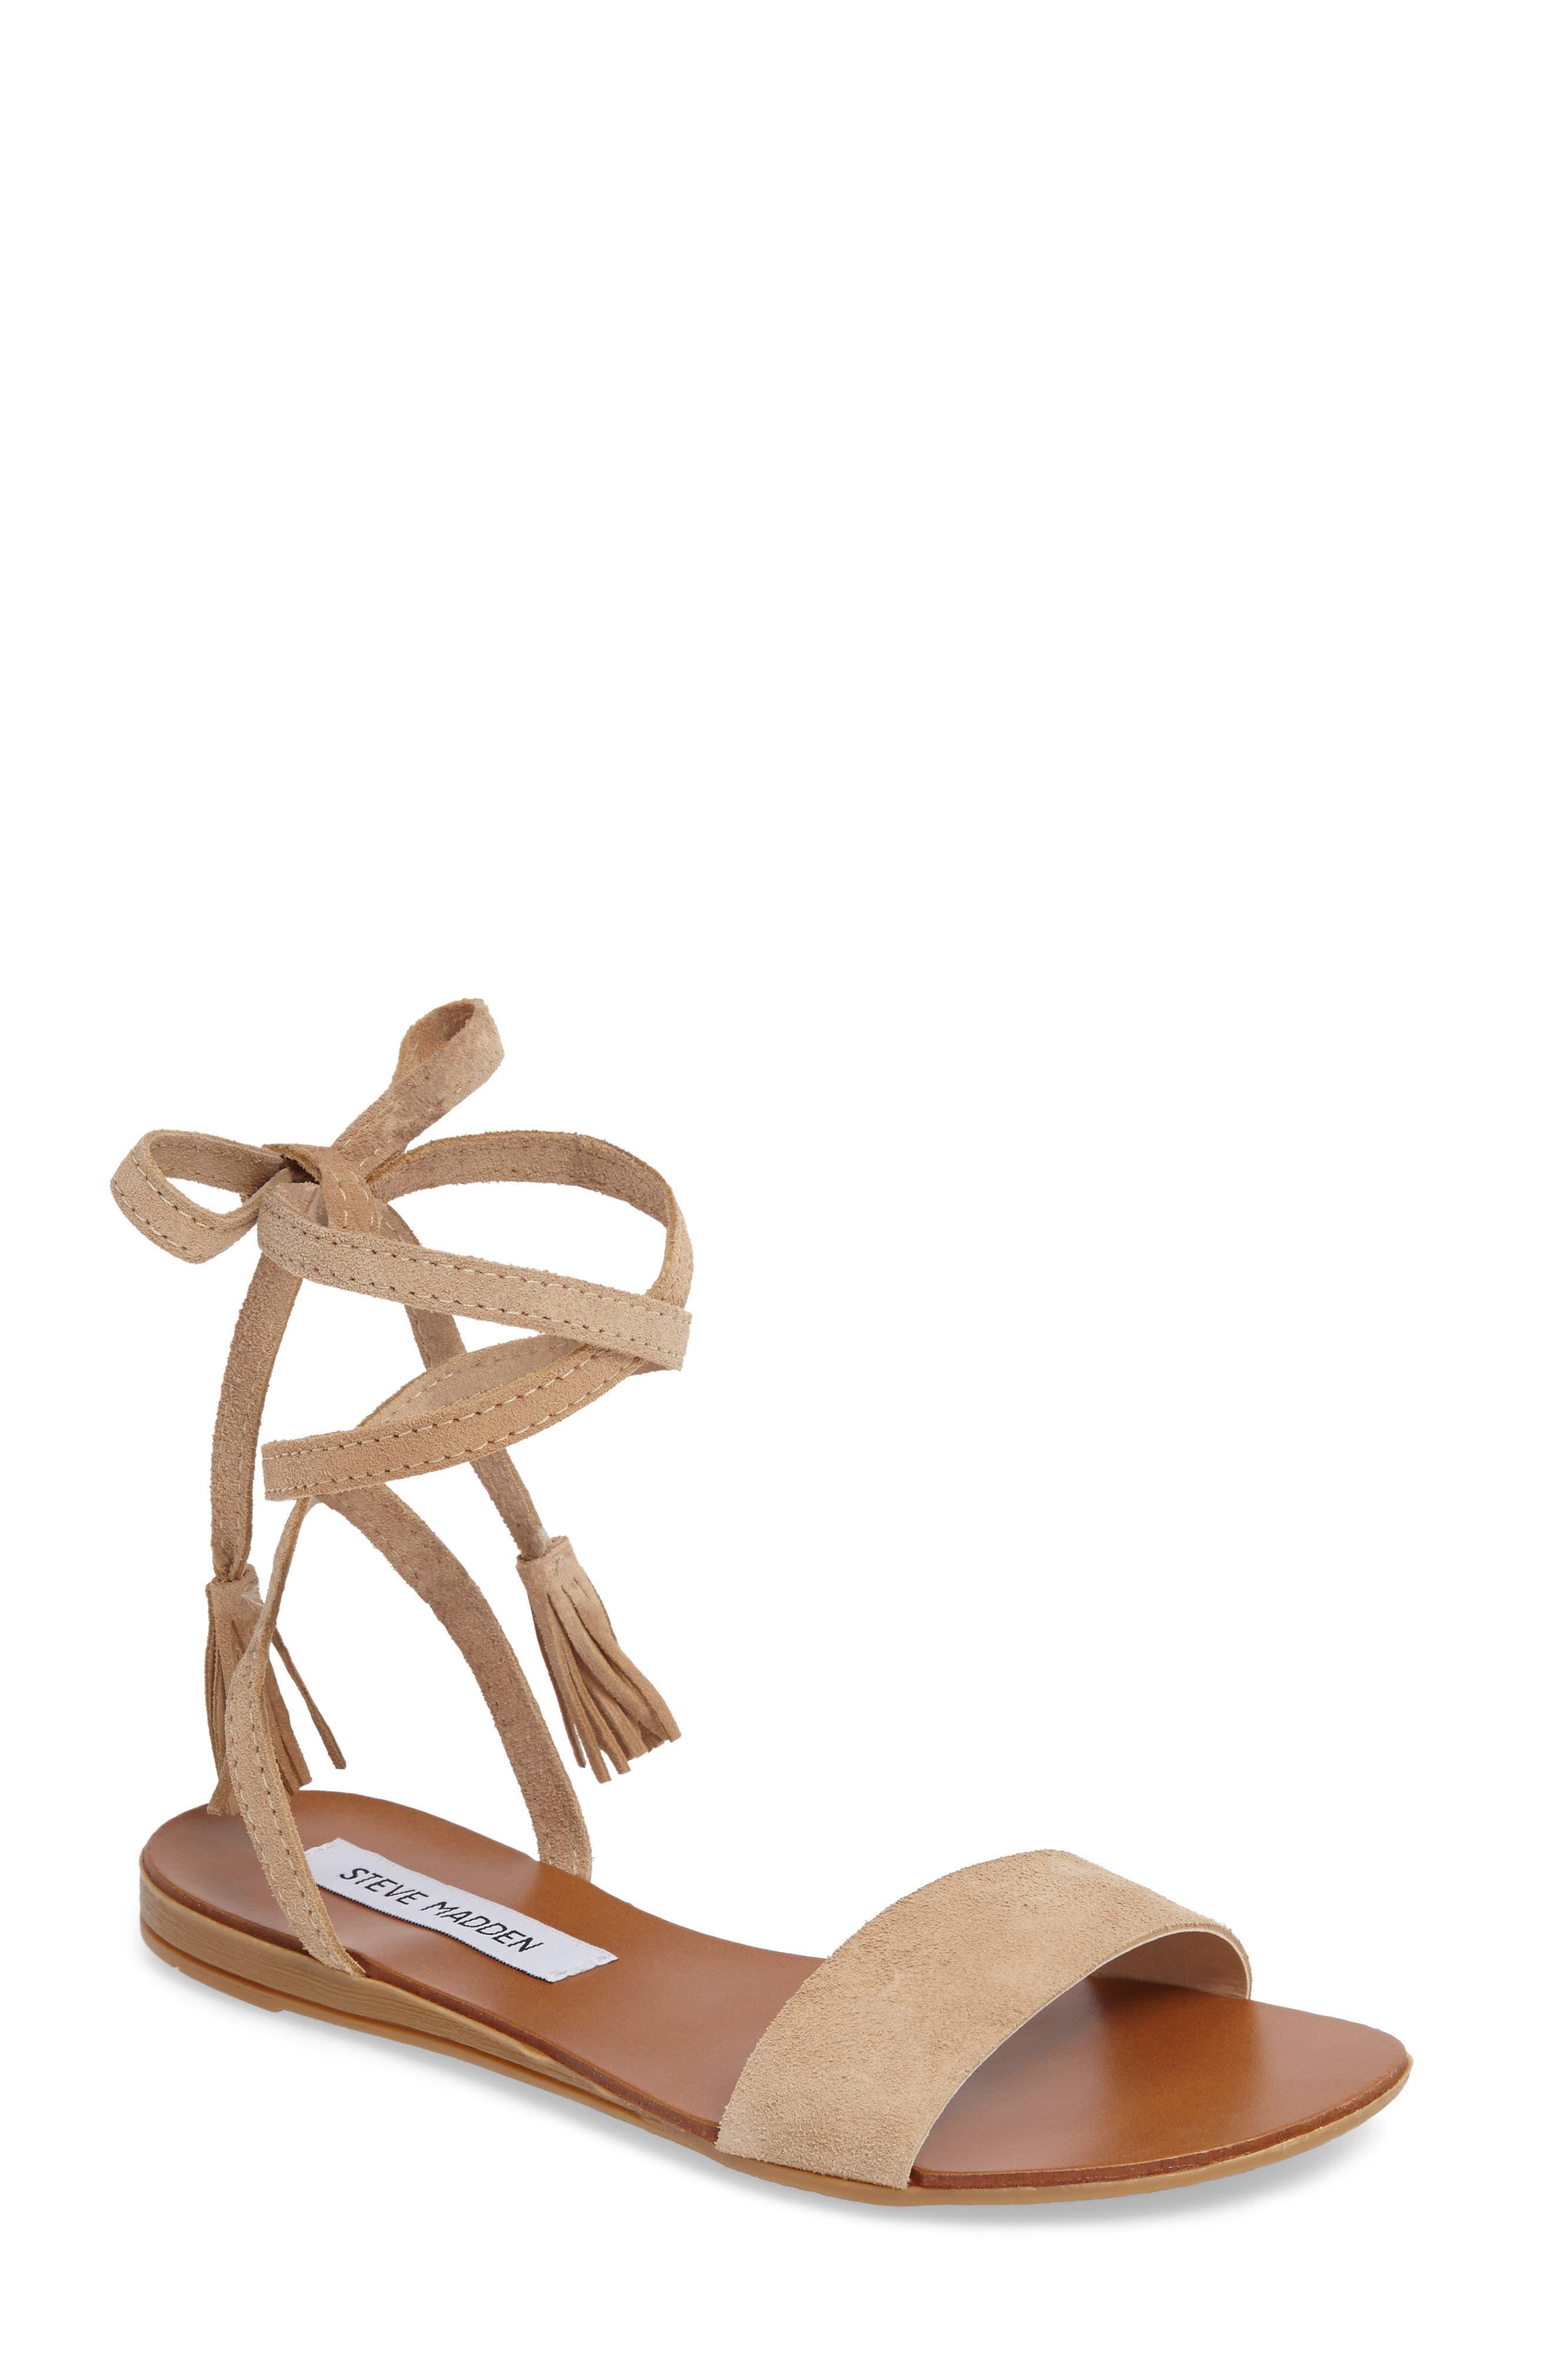 STEVE MADDEN Kapri Wraparound Lace Sandal